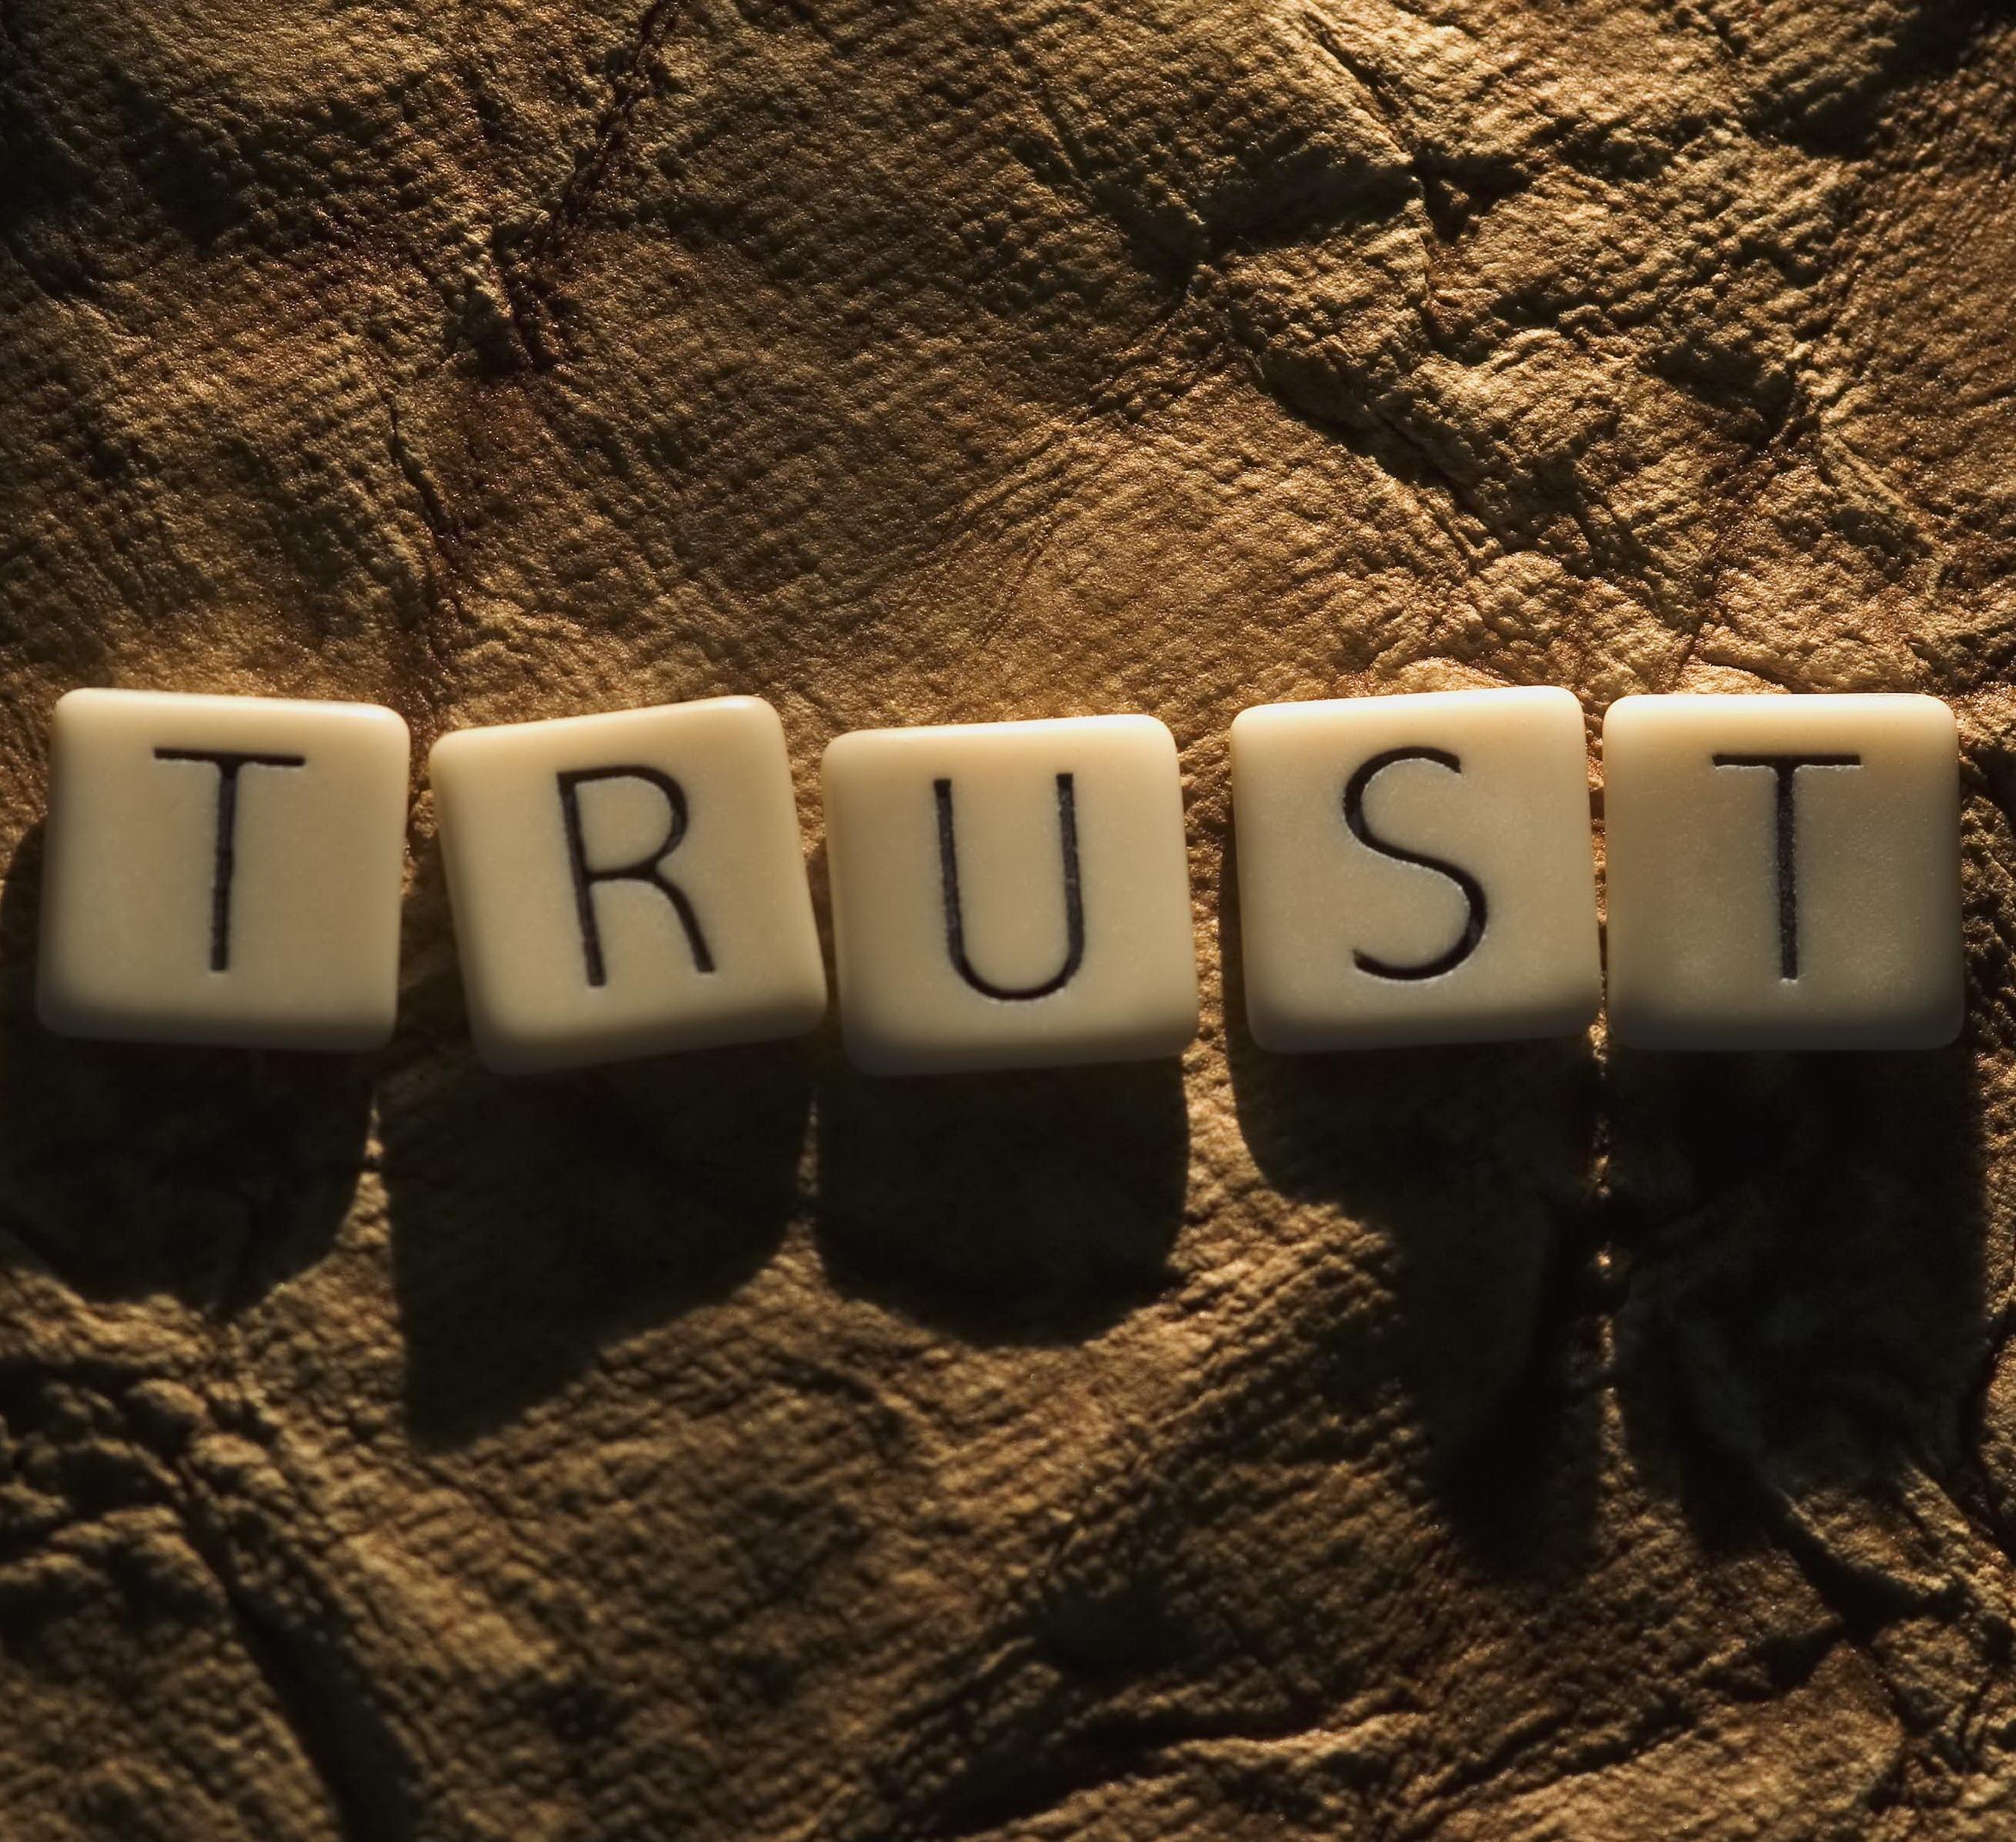 Cum sa castigati increderea clientilor online